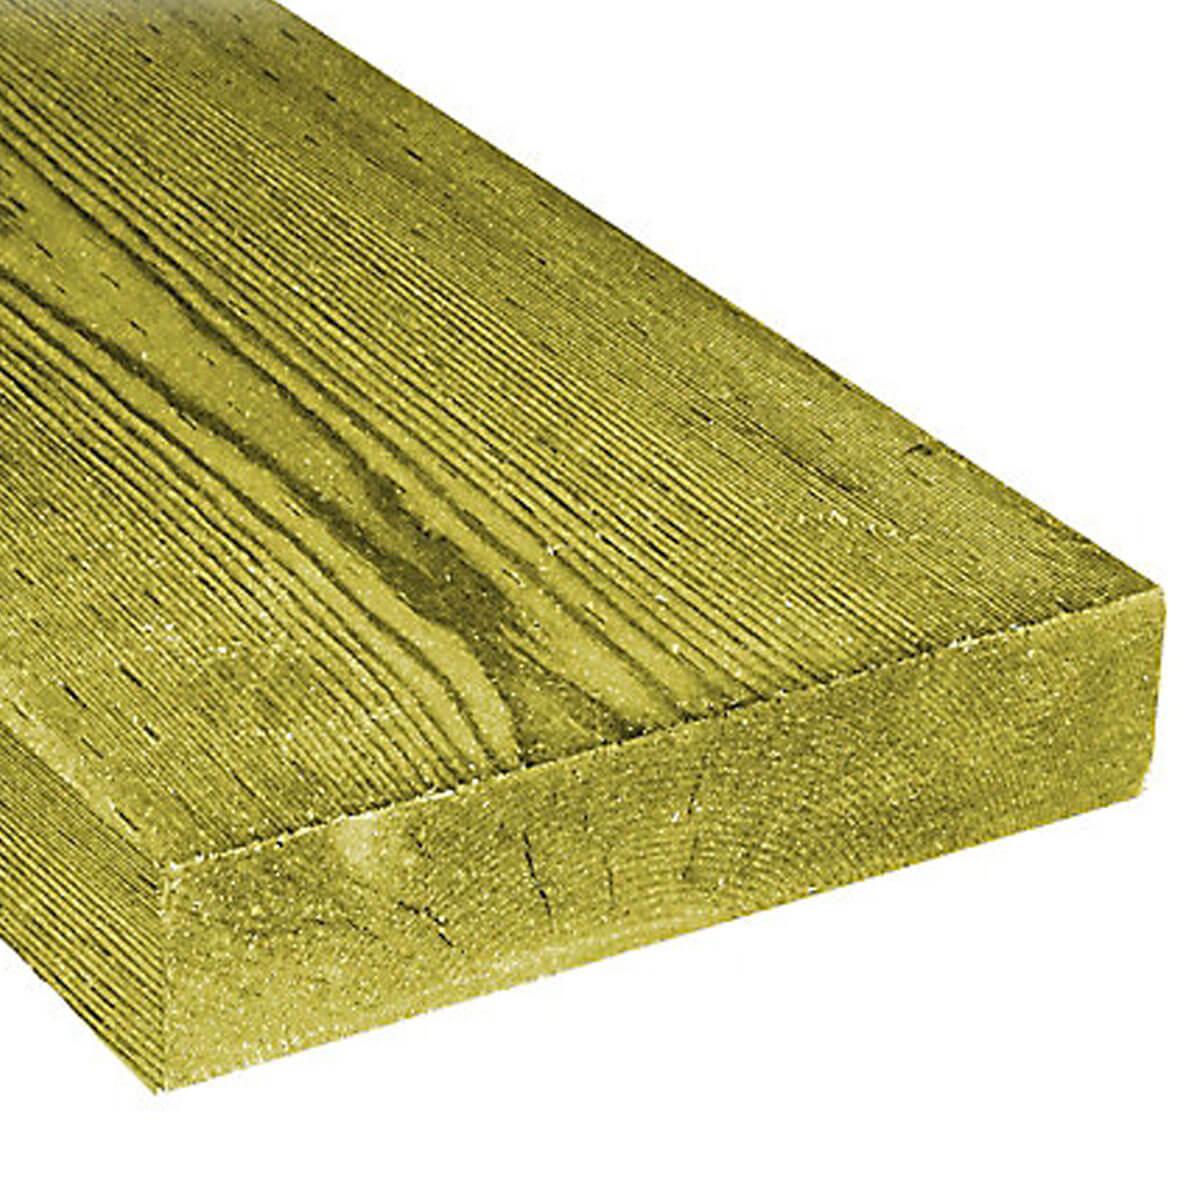 Treated Ground Contact Lumber - P/T - .40 - 2 x 6 x 16'